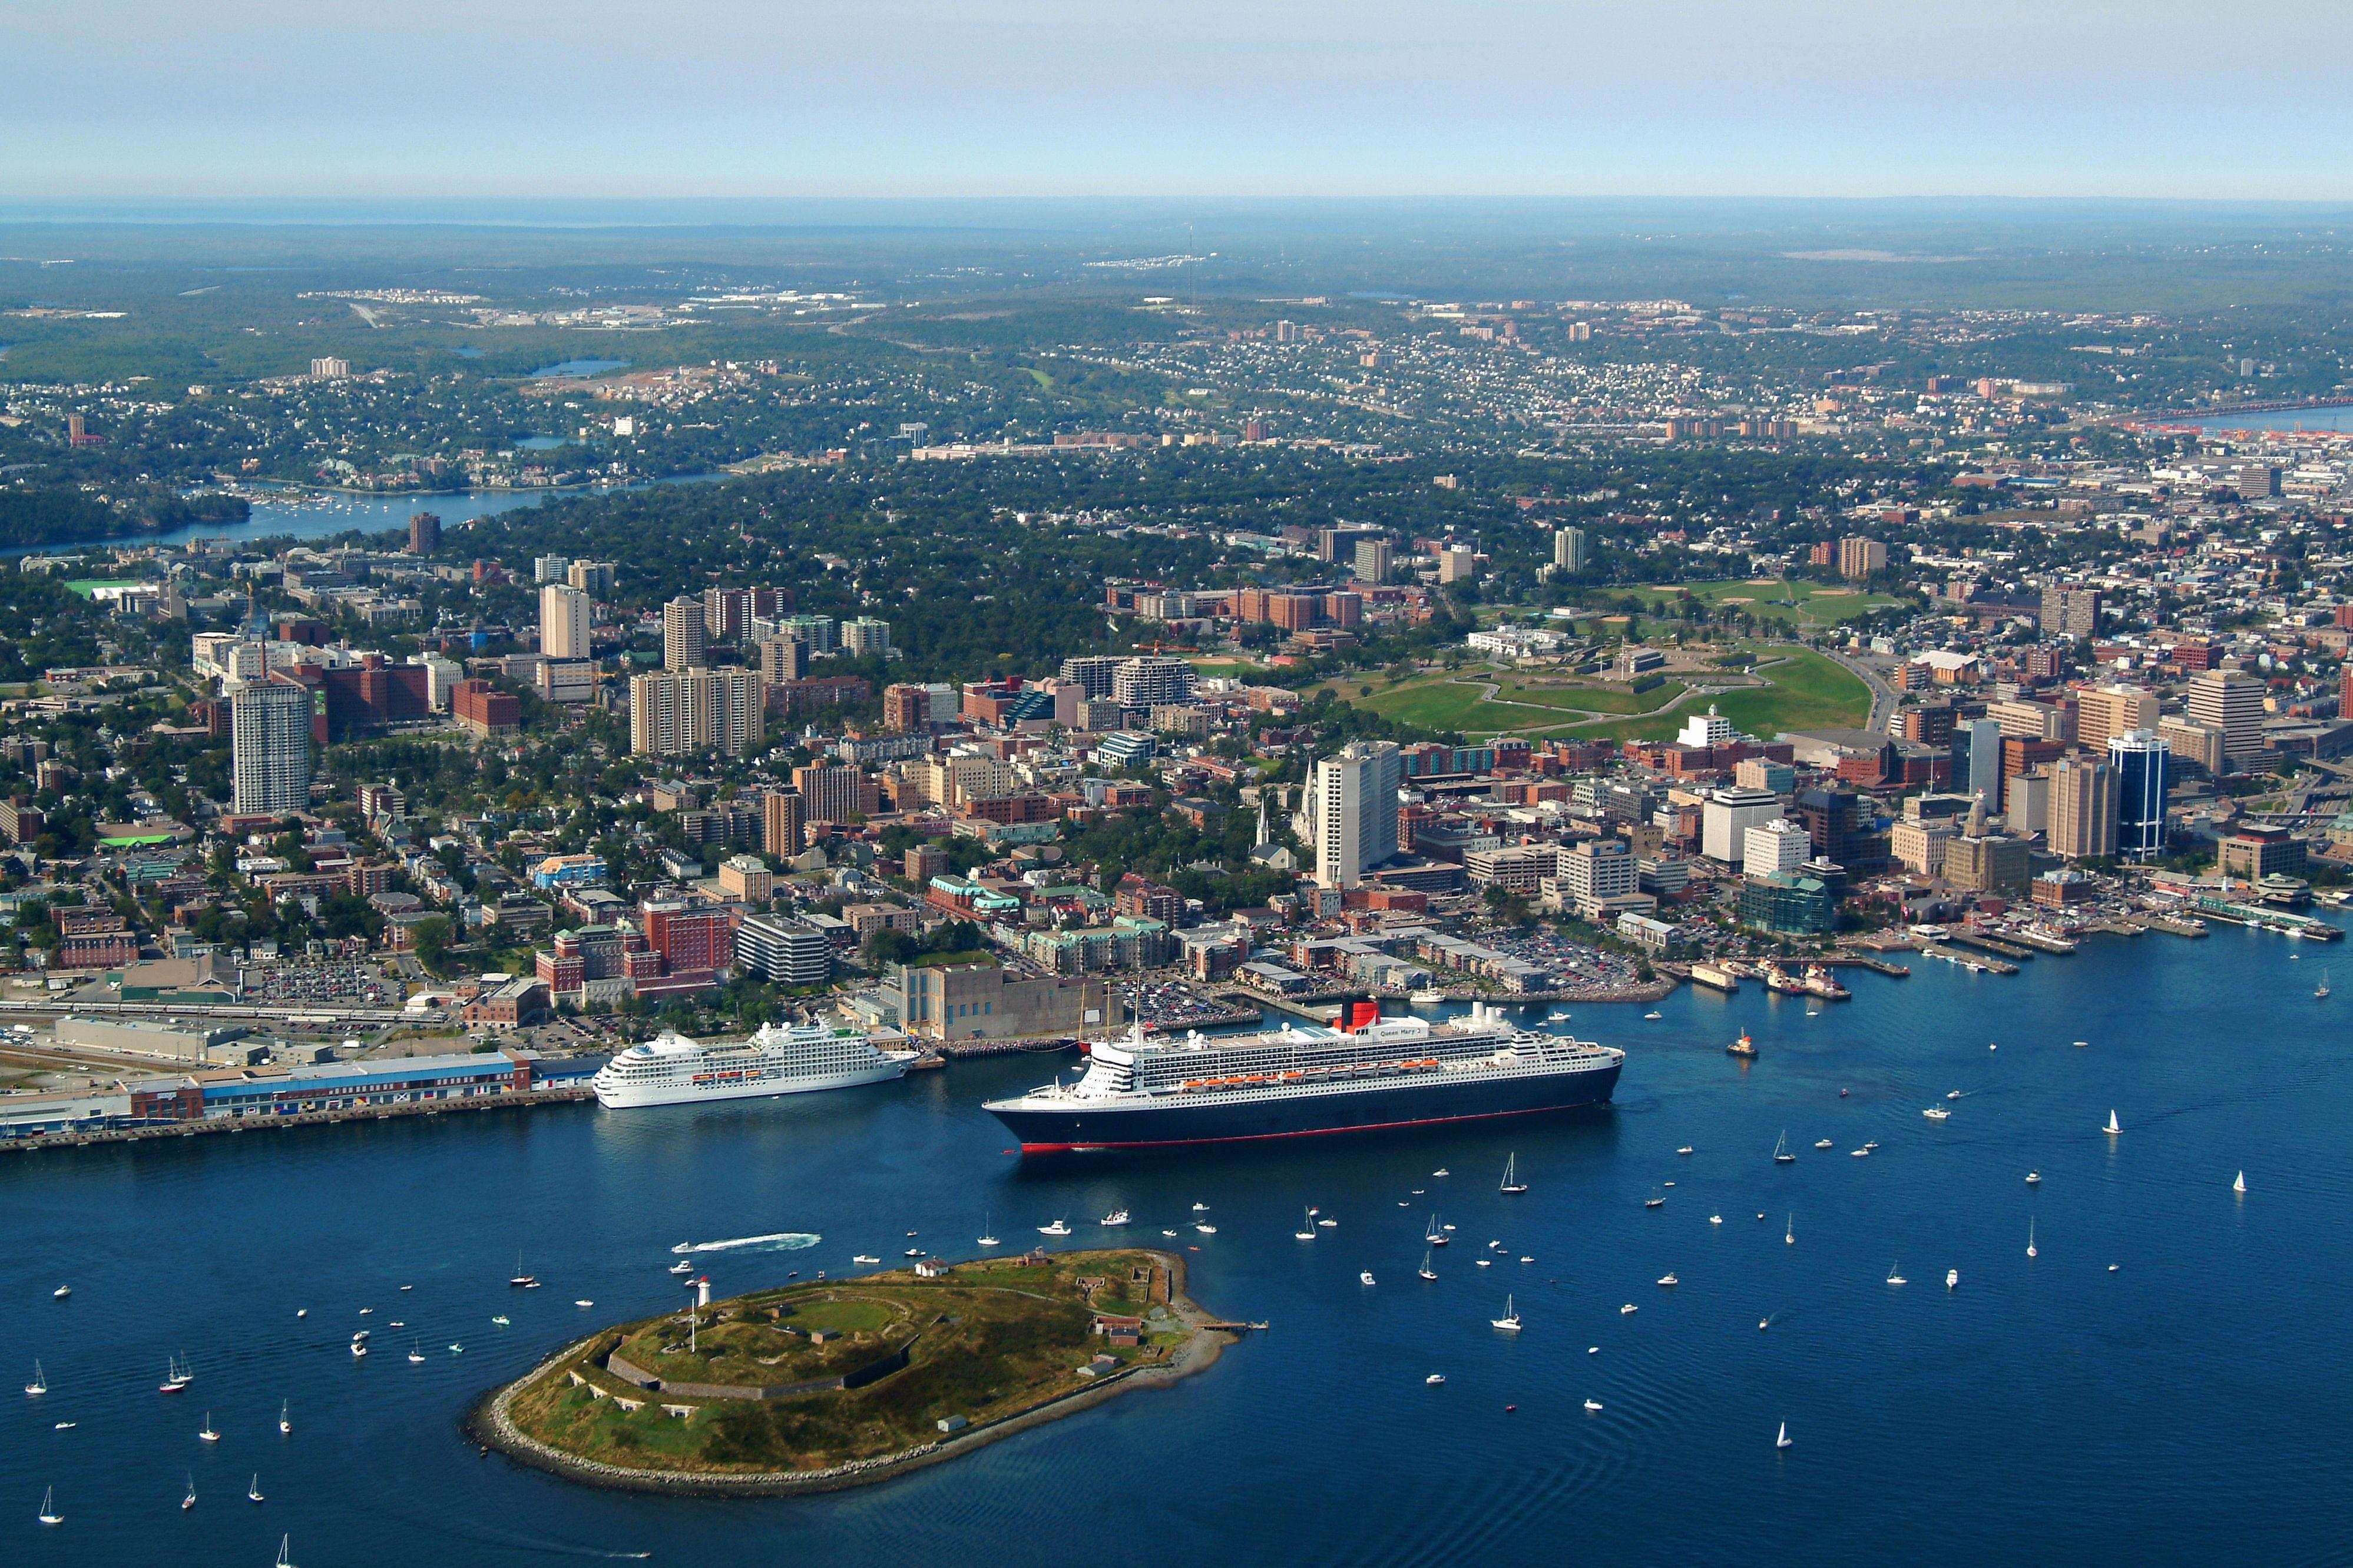 Busy Port Cruise Ships And Sail Boats Halifax Nova Scotia